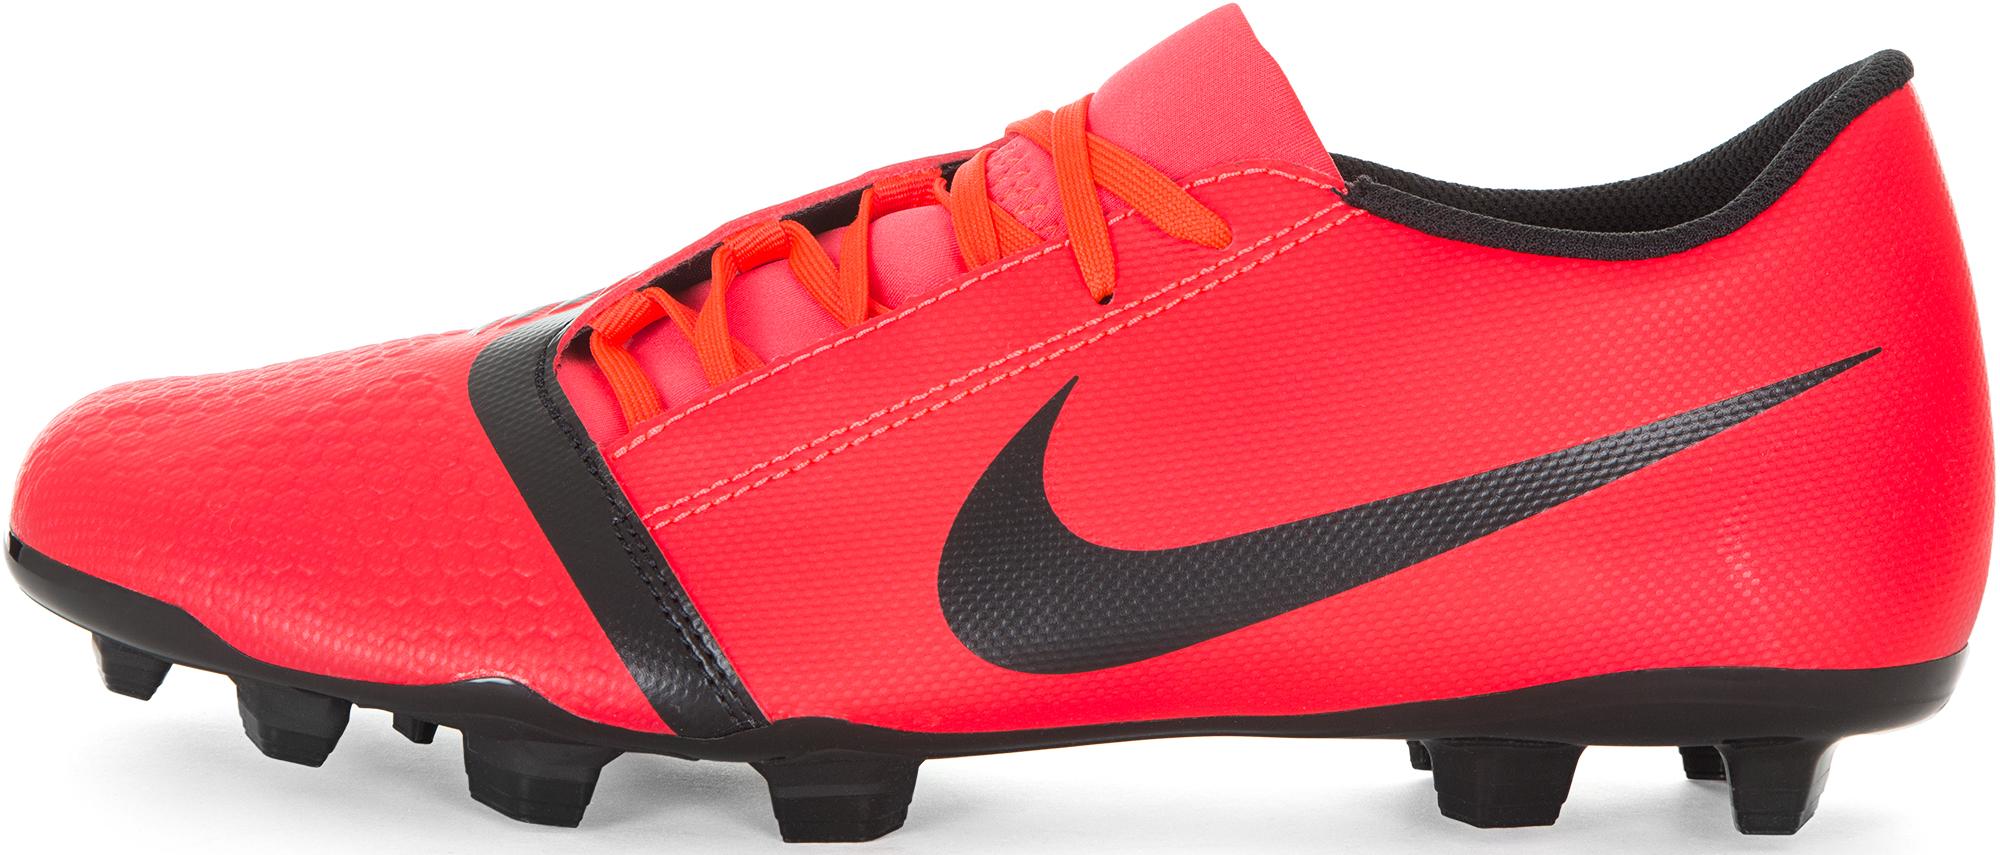 Nike Бутсы мужские Nike Phantom Venom Club FG, размер 45